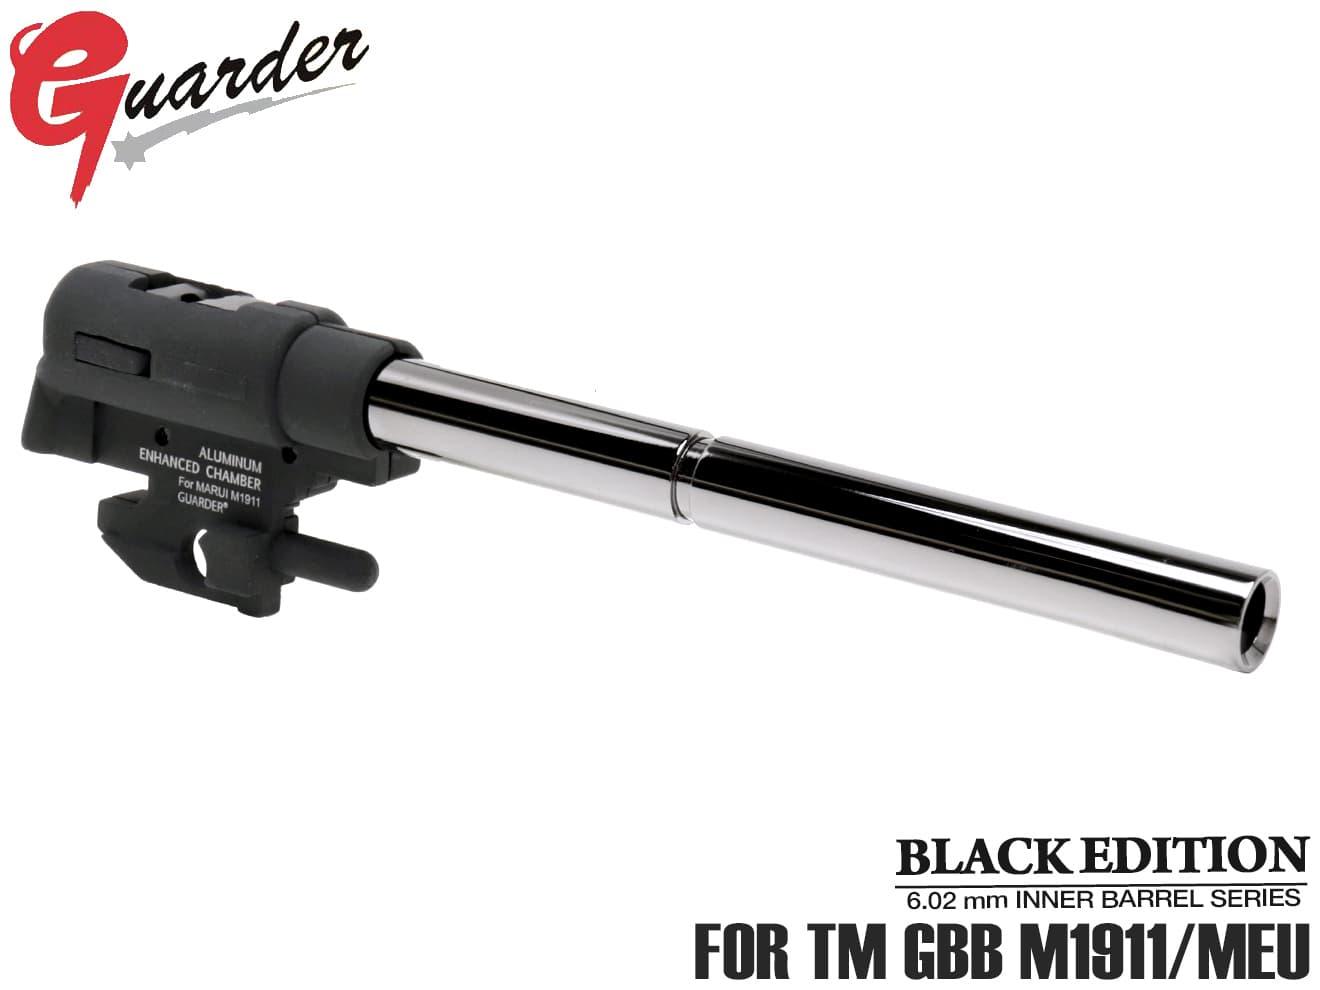 M1911-23■GUARDER KM 6.01 インナーバレル + 強化ホップアップチャンバー フルセット M1911/MEU◆長掛けホップ 東京マルイ M1911/MEU対応 ホップ量アップ